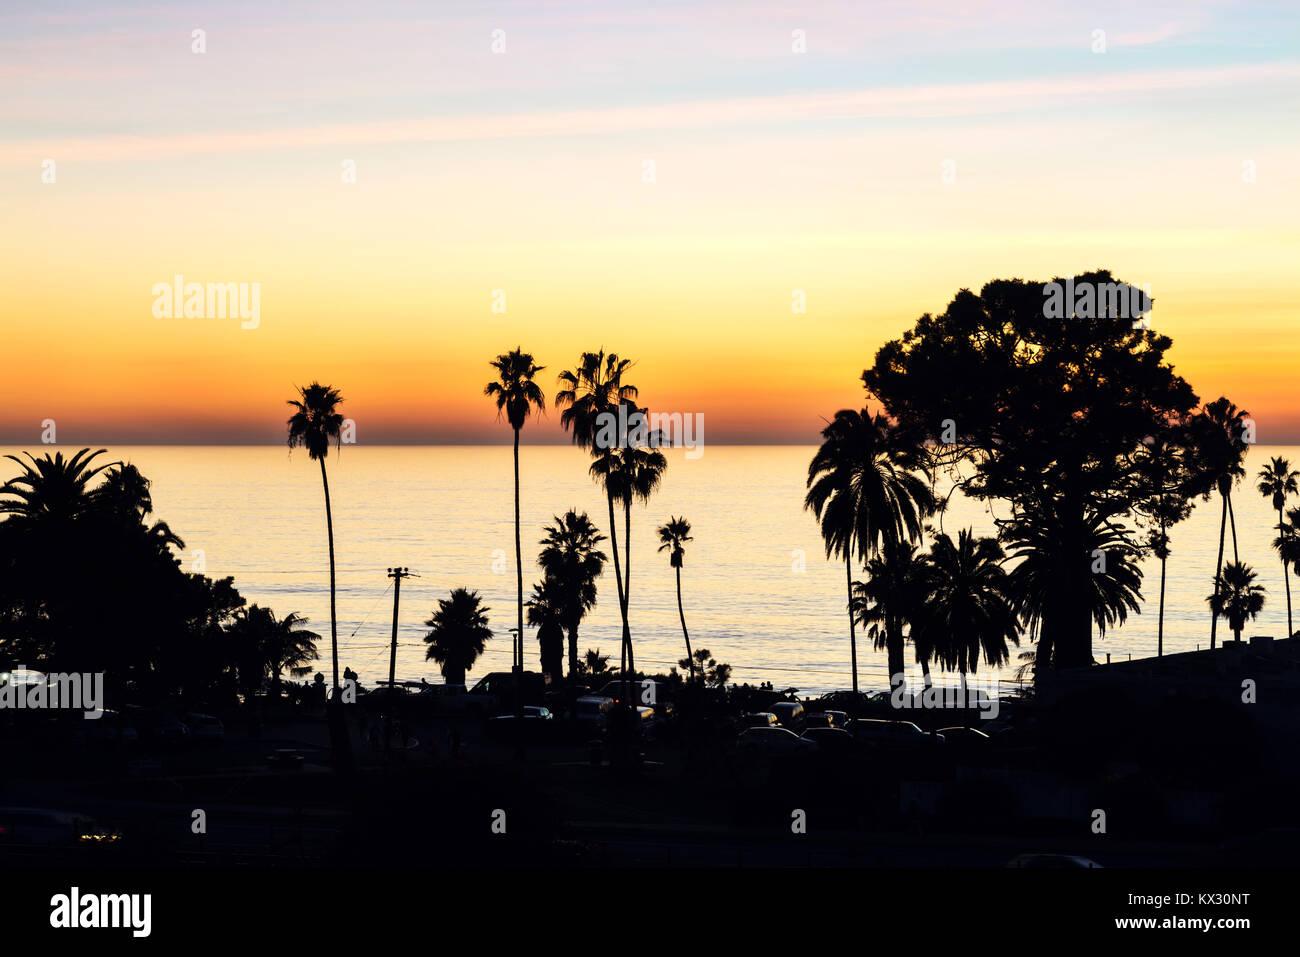 Looking down on the coastal city of Encinitas, California. - Stock Image